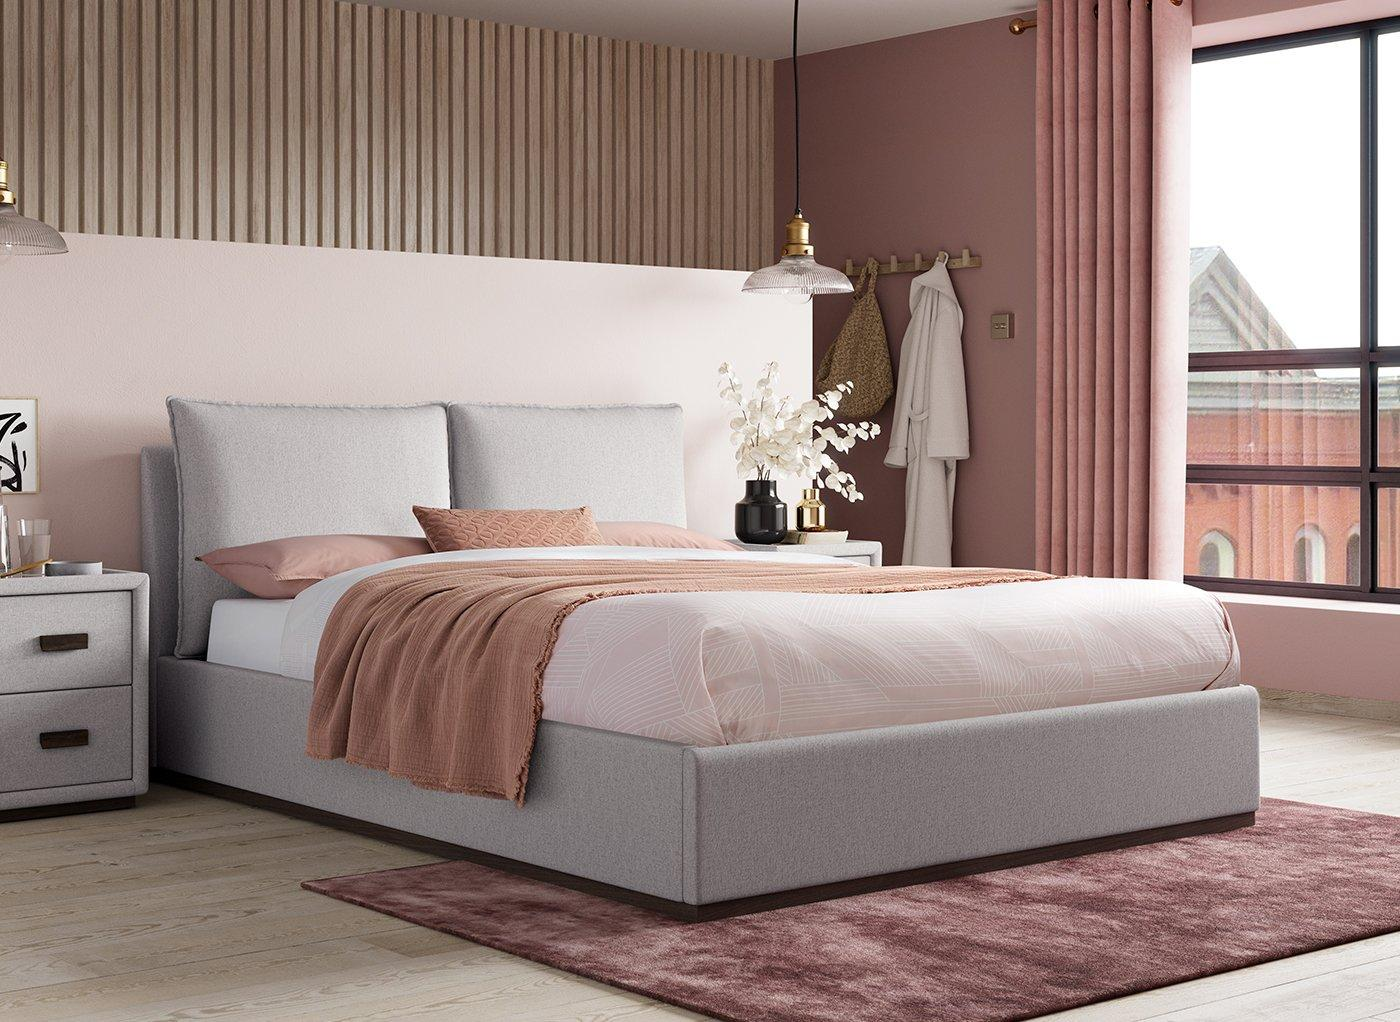 Riley Upholstered Ottoman Bed Frame (£799)